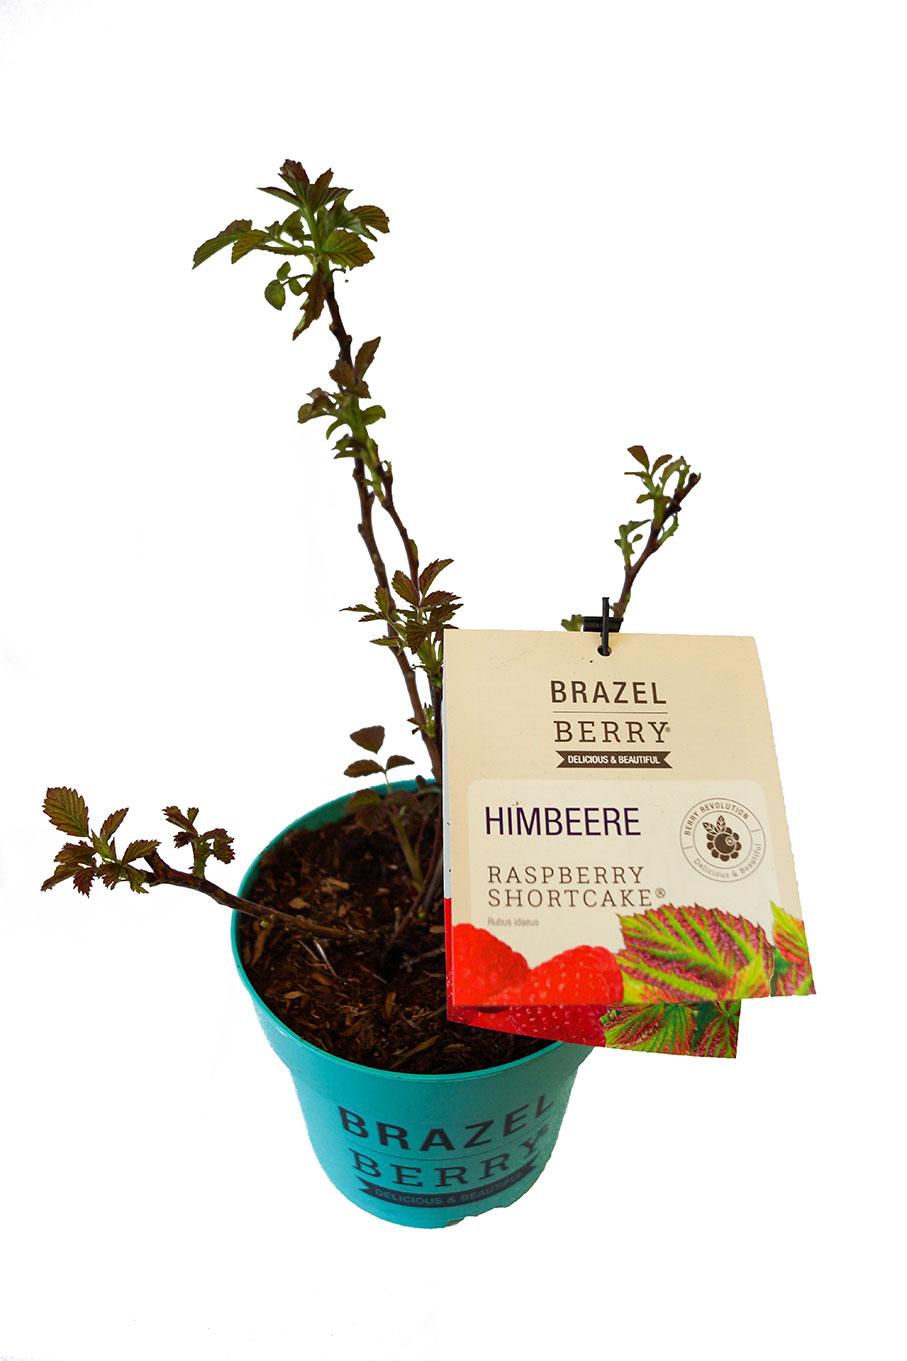 Brazel Berry Himbeere Raspberry Shortcake